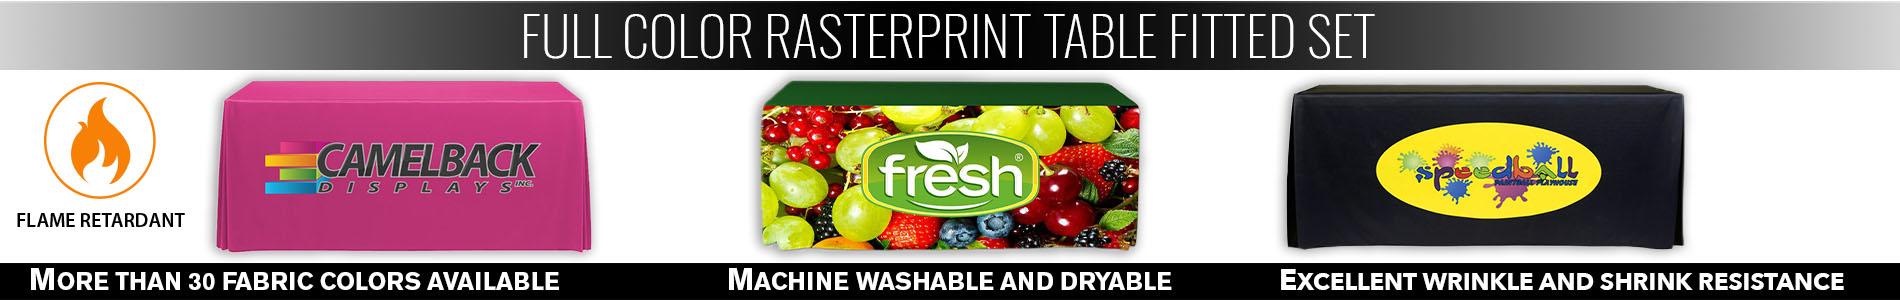 Full Color Rasterprint Table Fitted Set